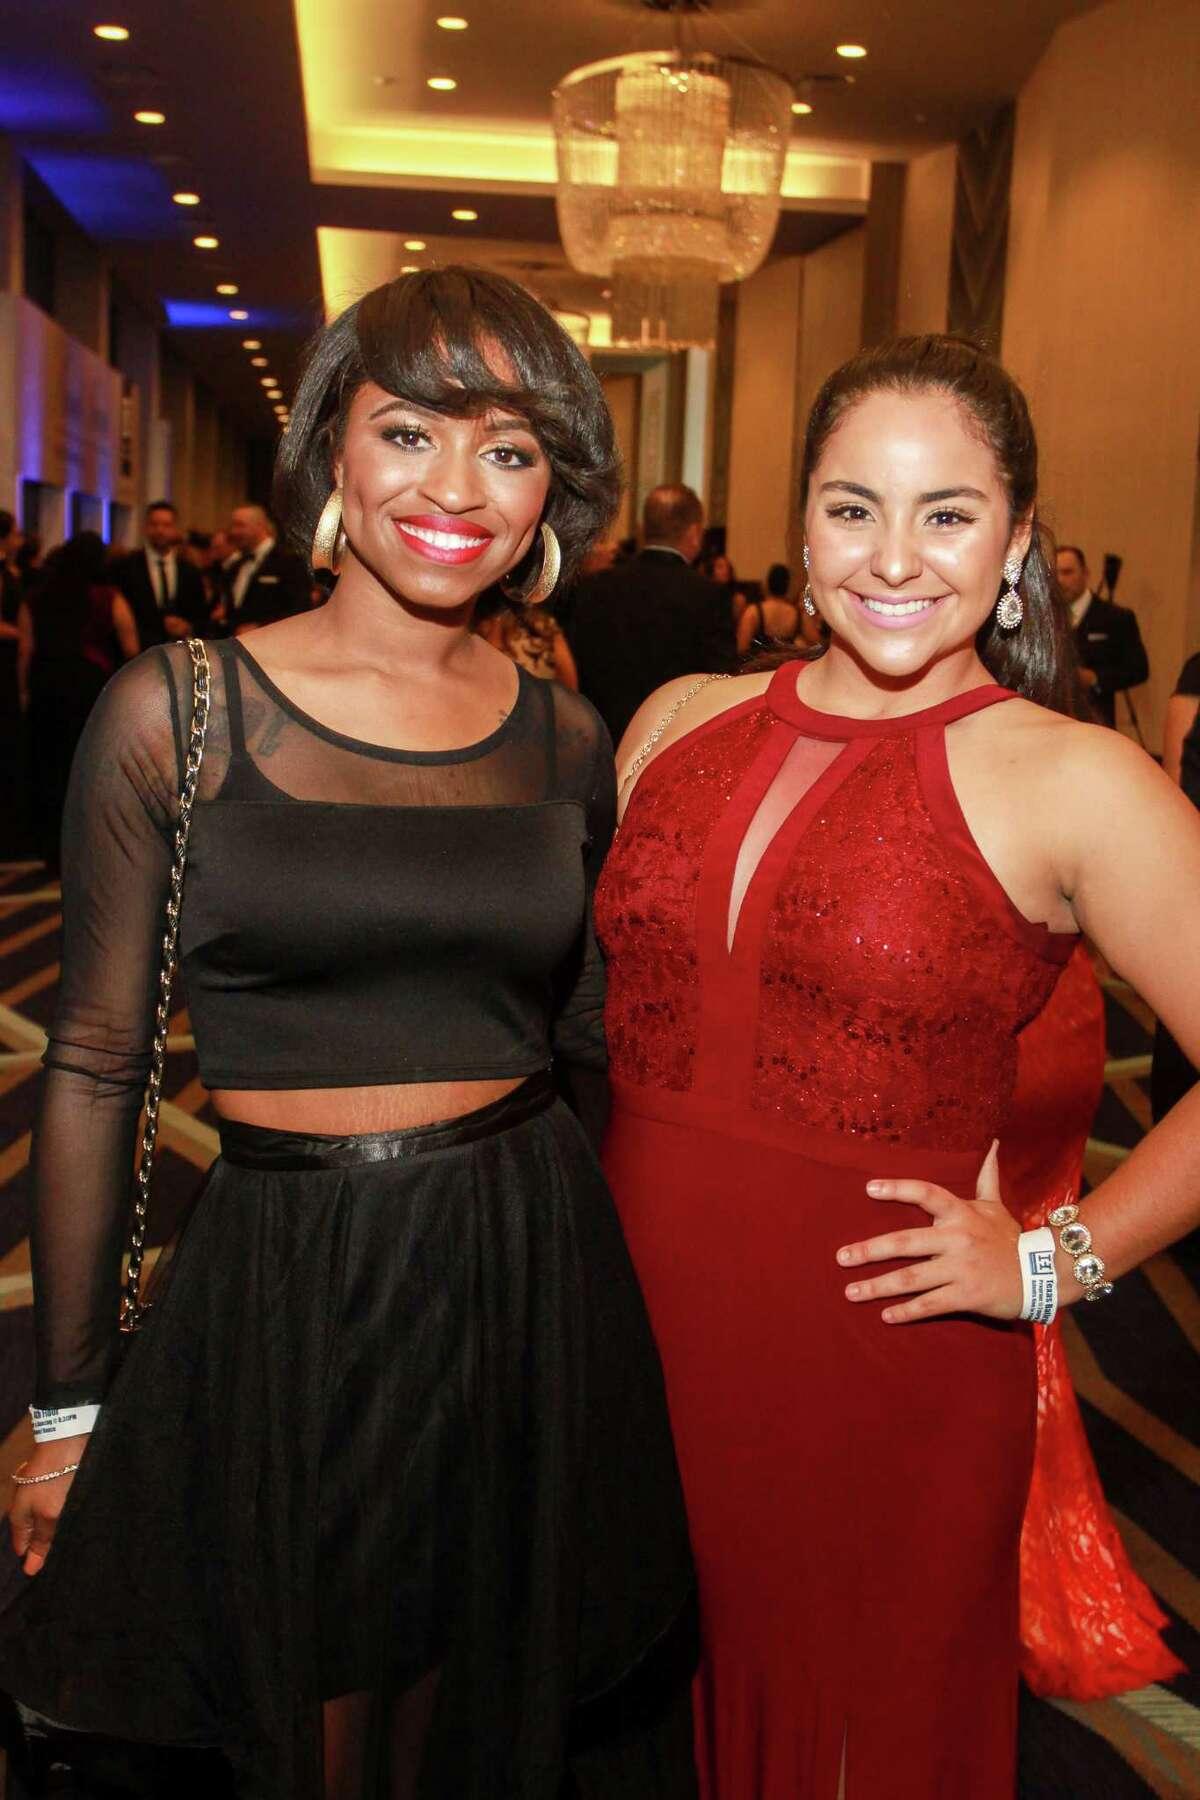 Arnaecia Alridge, left, and Maria Smith at the Houston Hispanic Chamber of Commerce annual awards and gala.